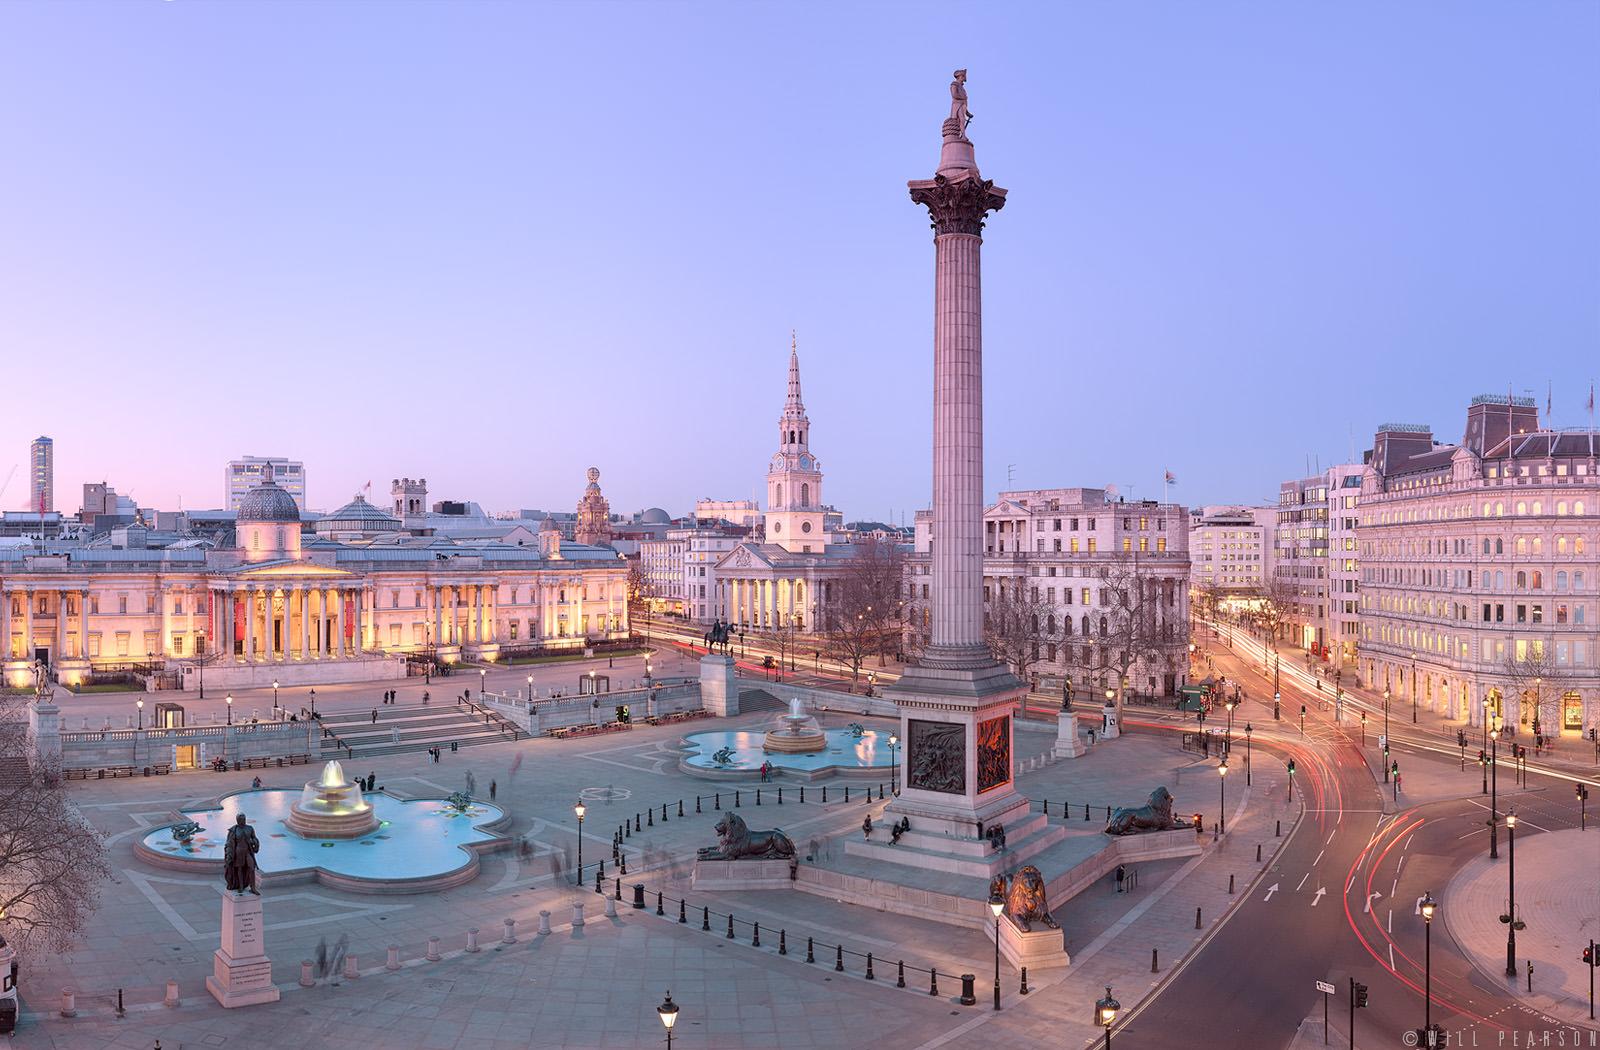 Imagen de Trafalgar Square, Londres, Inglaterra